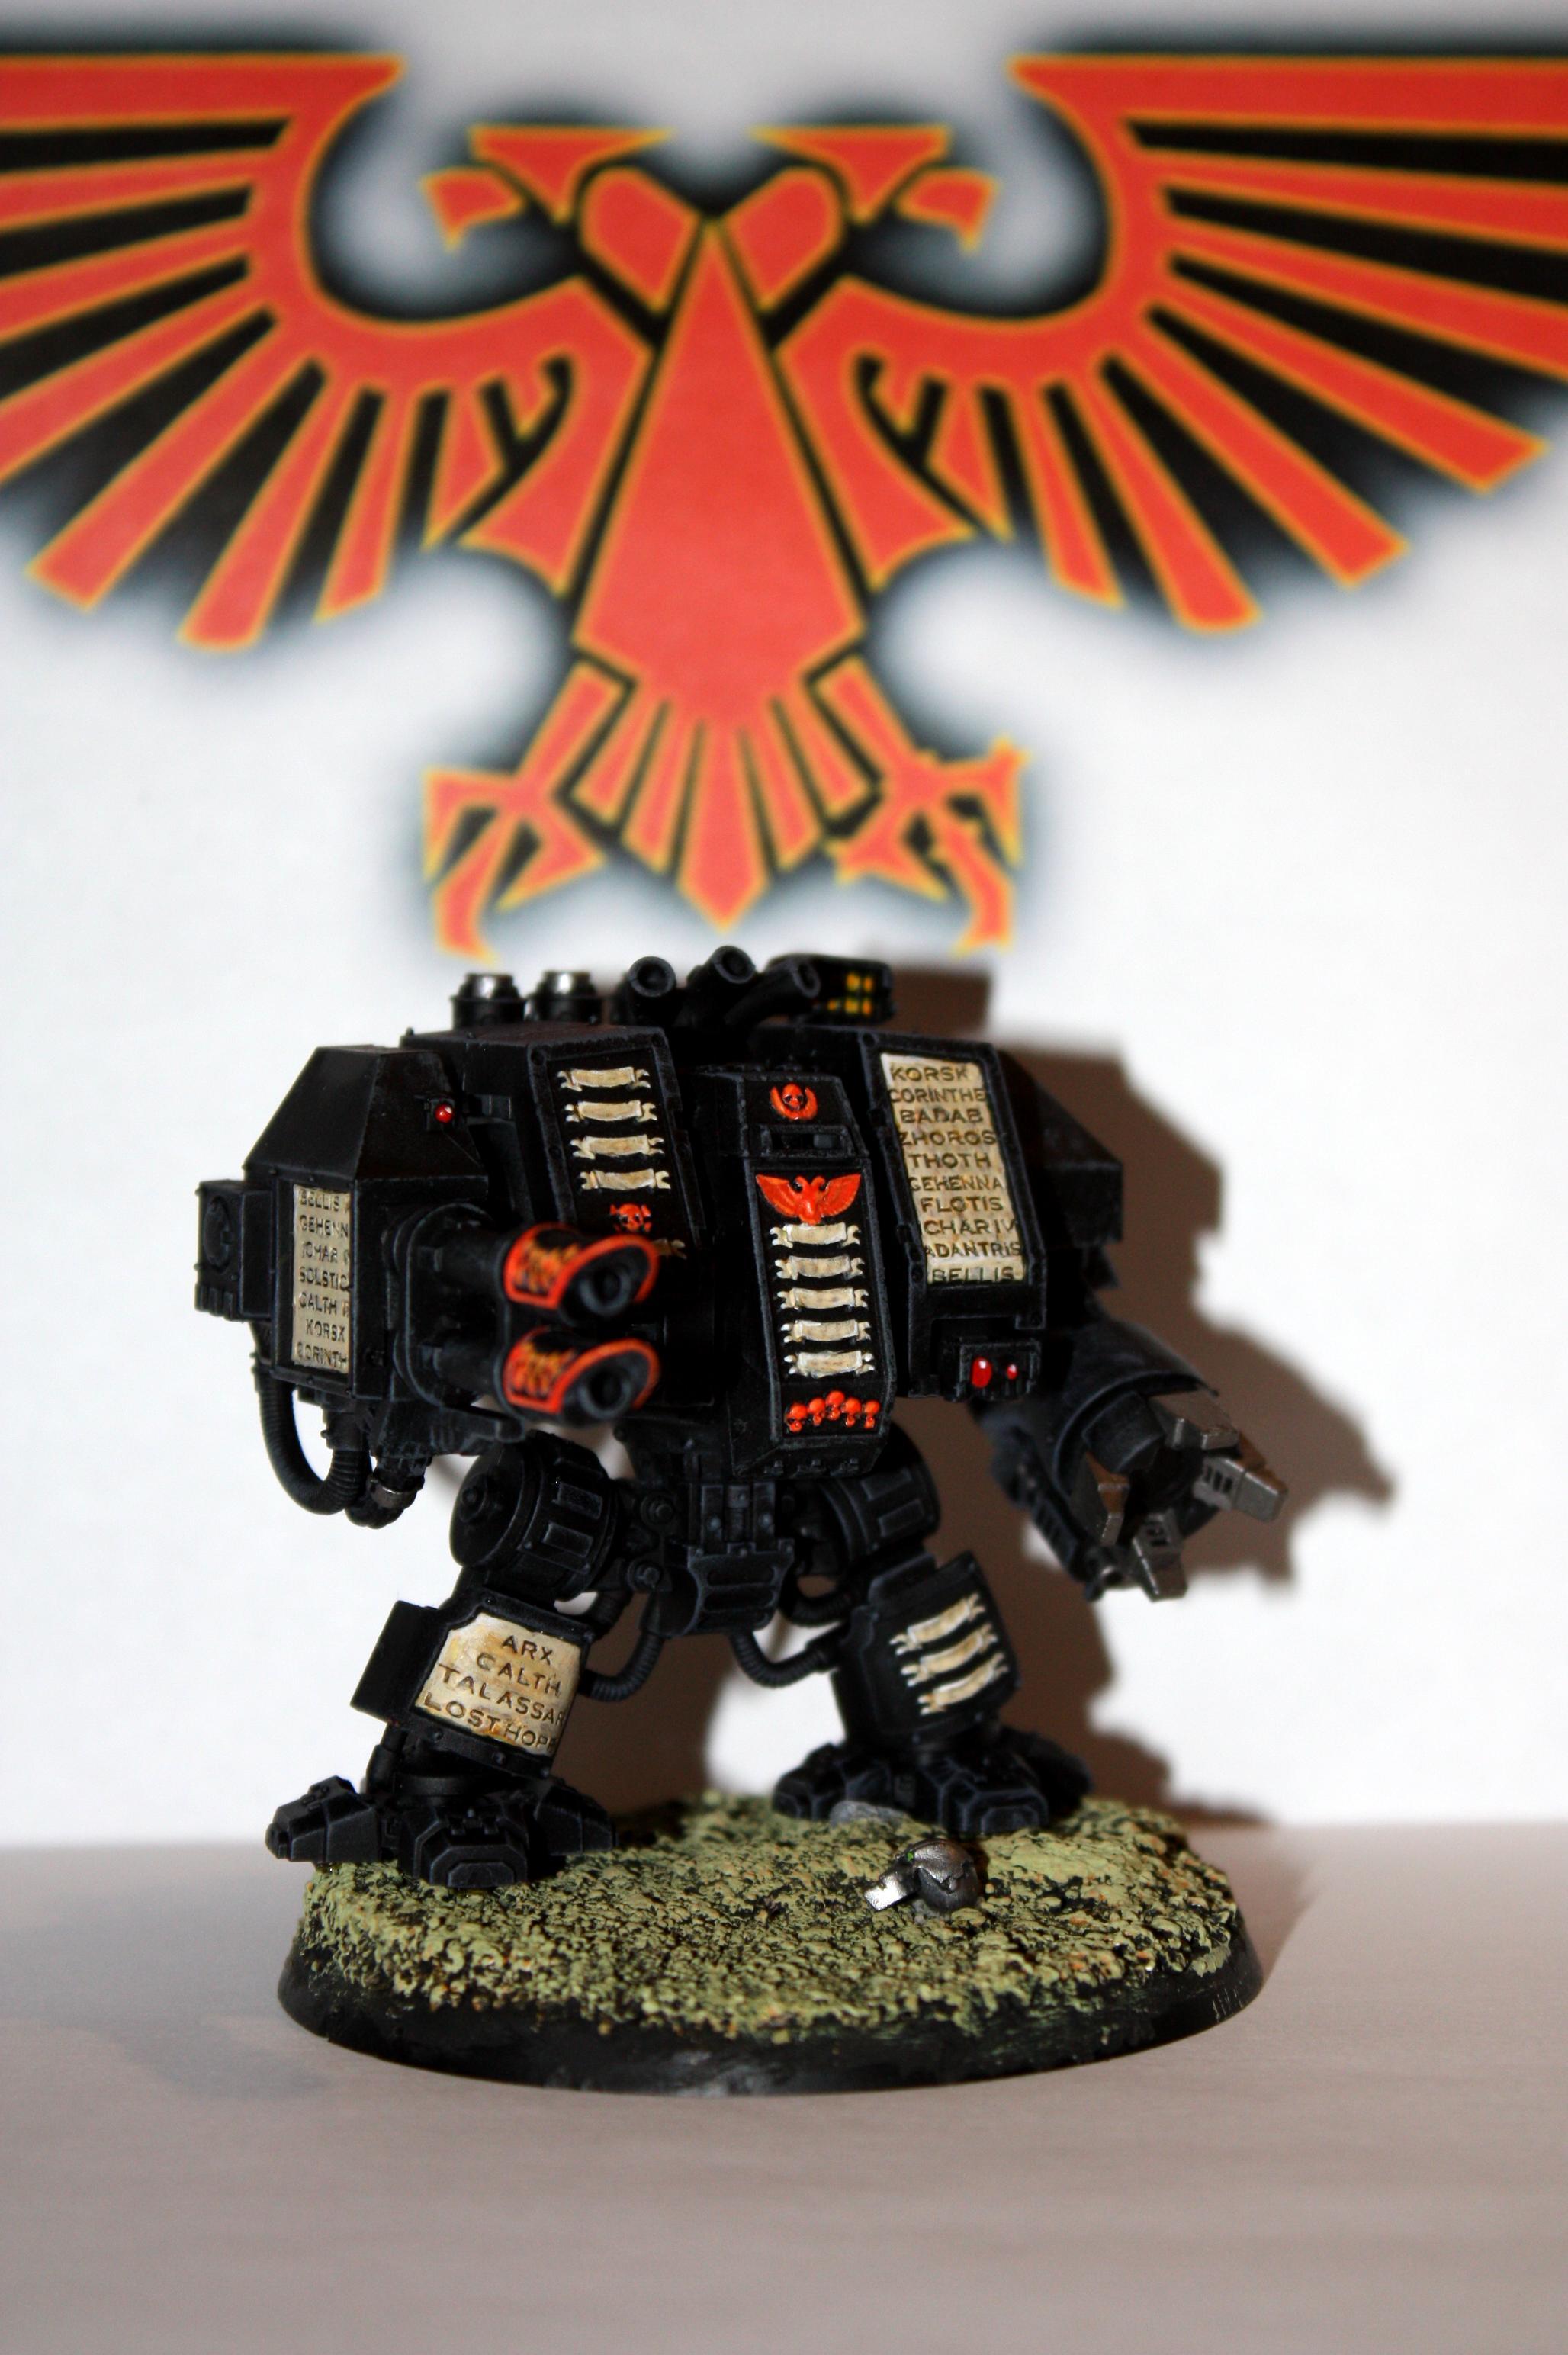 Chapter, Dreadnought, Drybrush, Phoenix, Space Marines, Venerable, Warhammer 40,000, Warhammer Fantasy